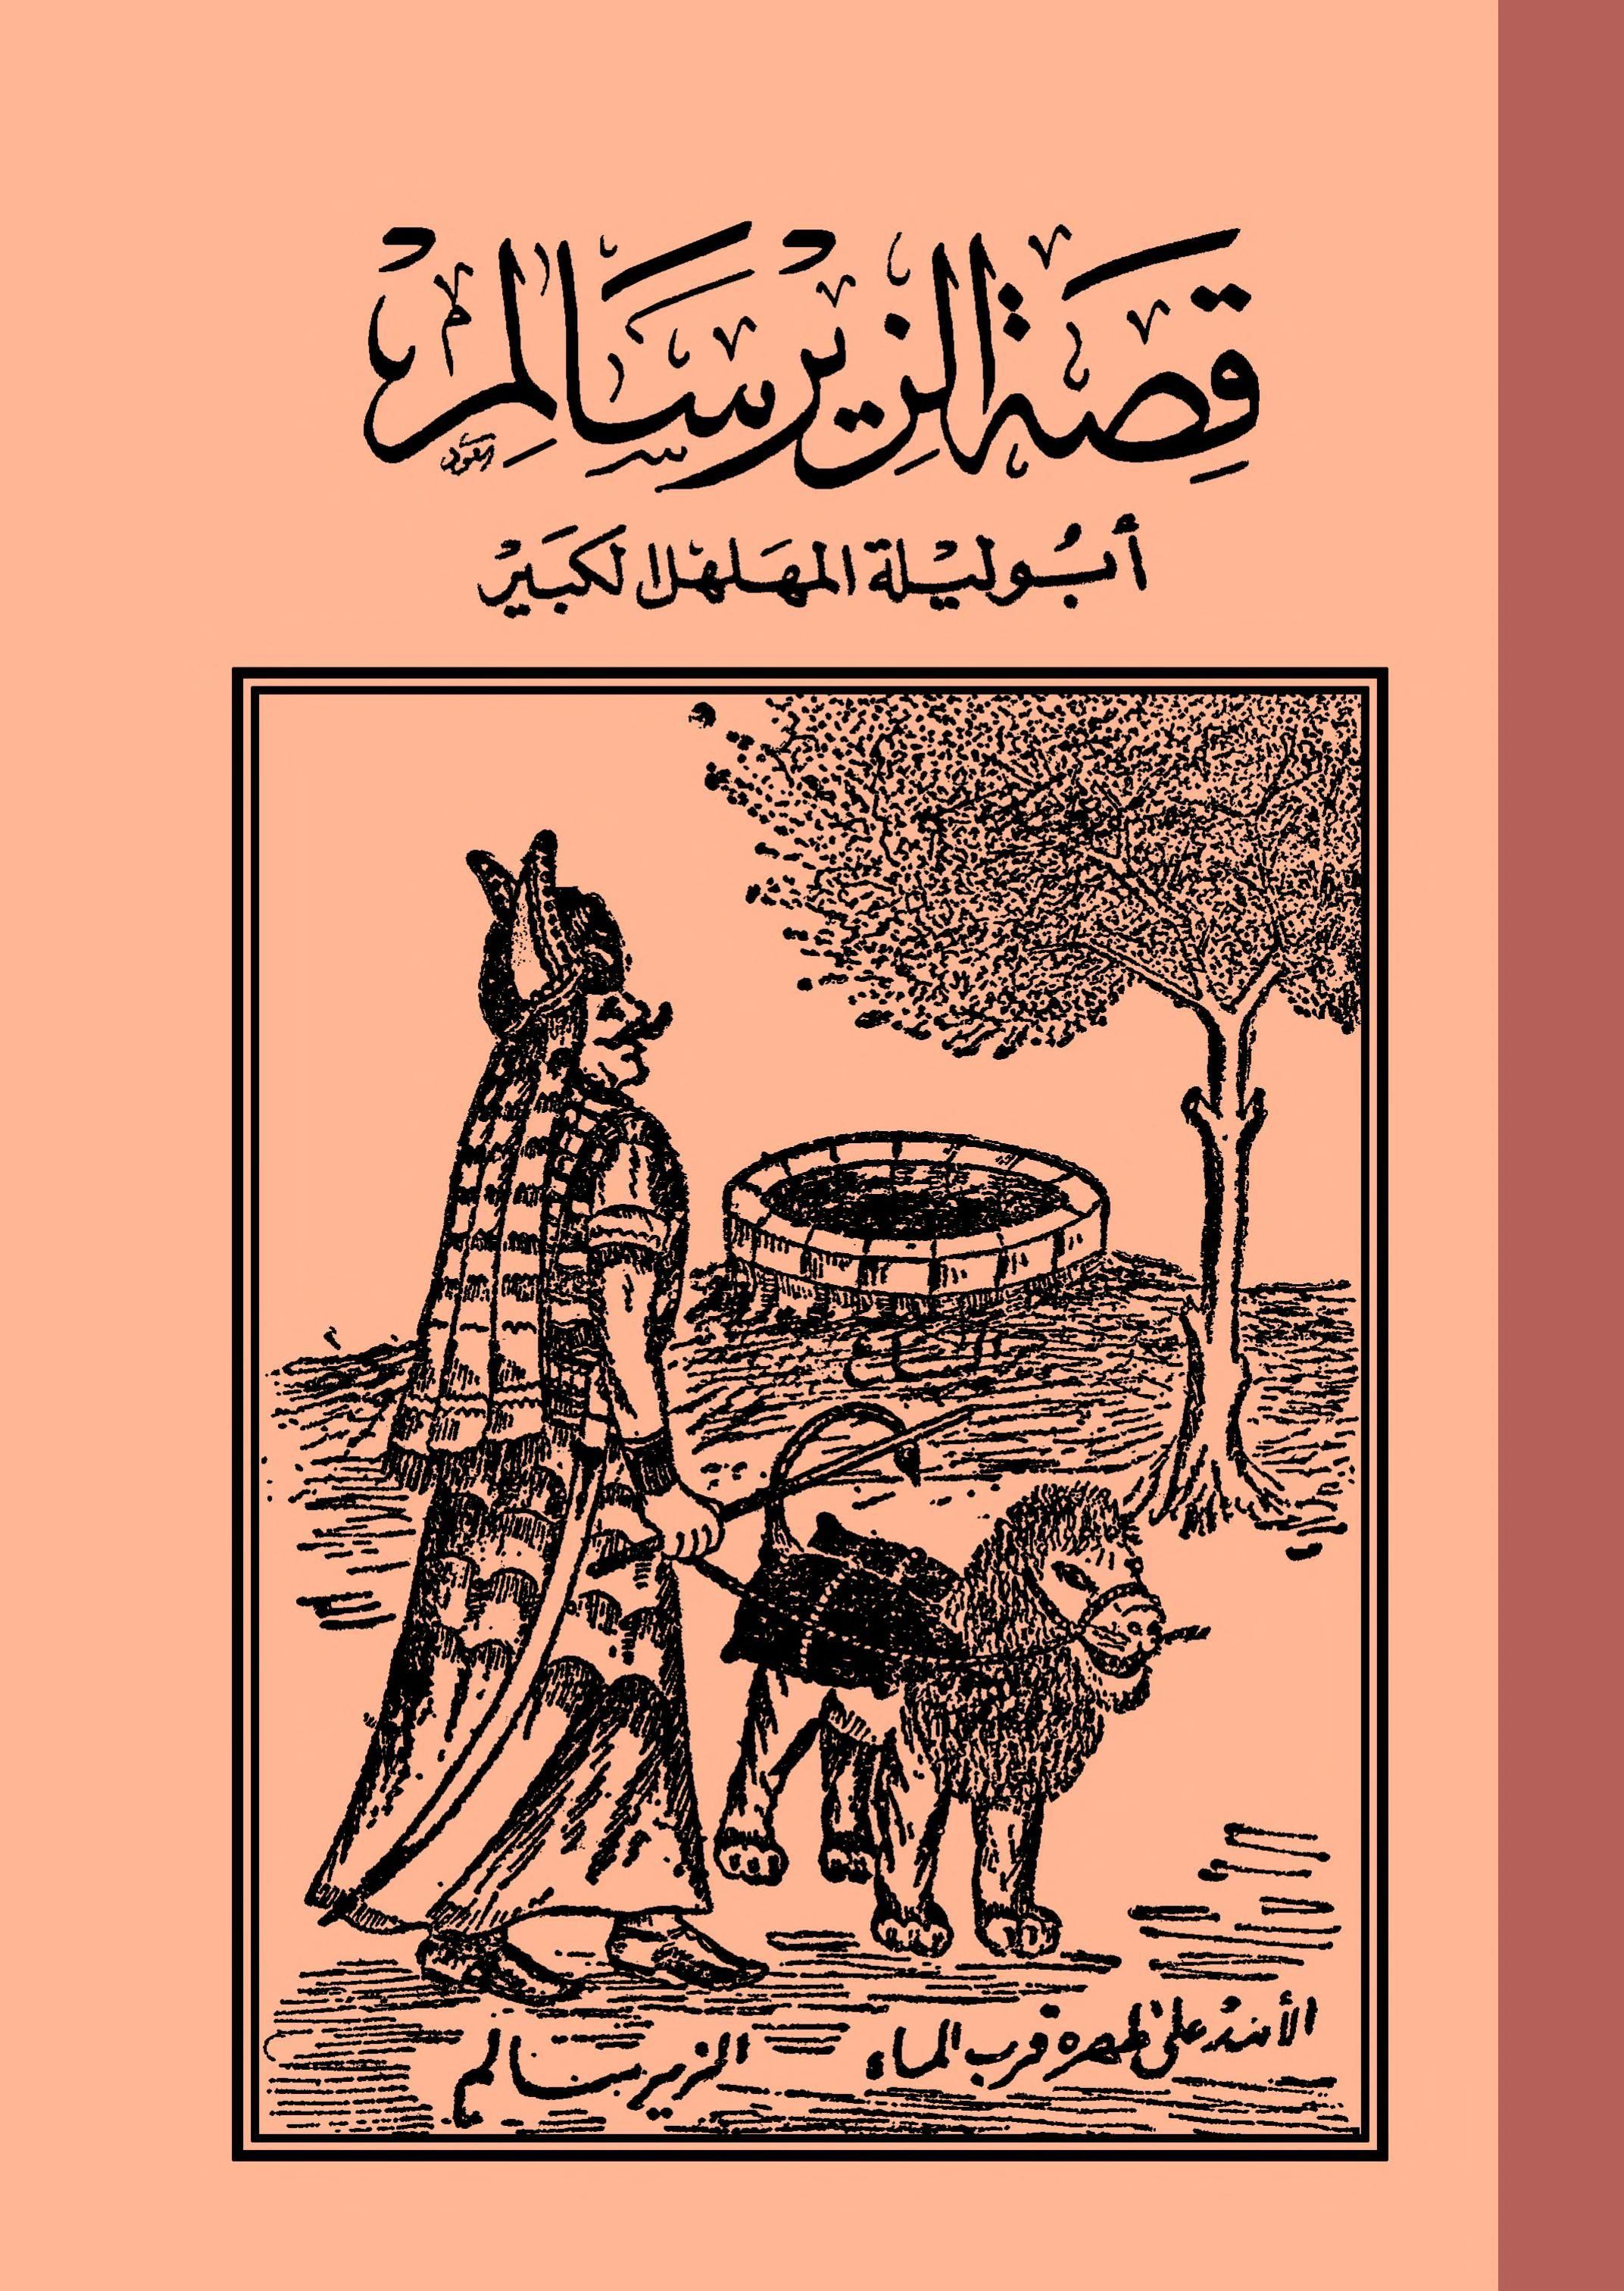 قصة الزير سالم Free Download Borrow And Streaming Internet Archive Internet Archive Pdf Books Reading Pdf Books Download